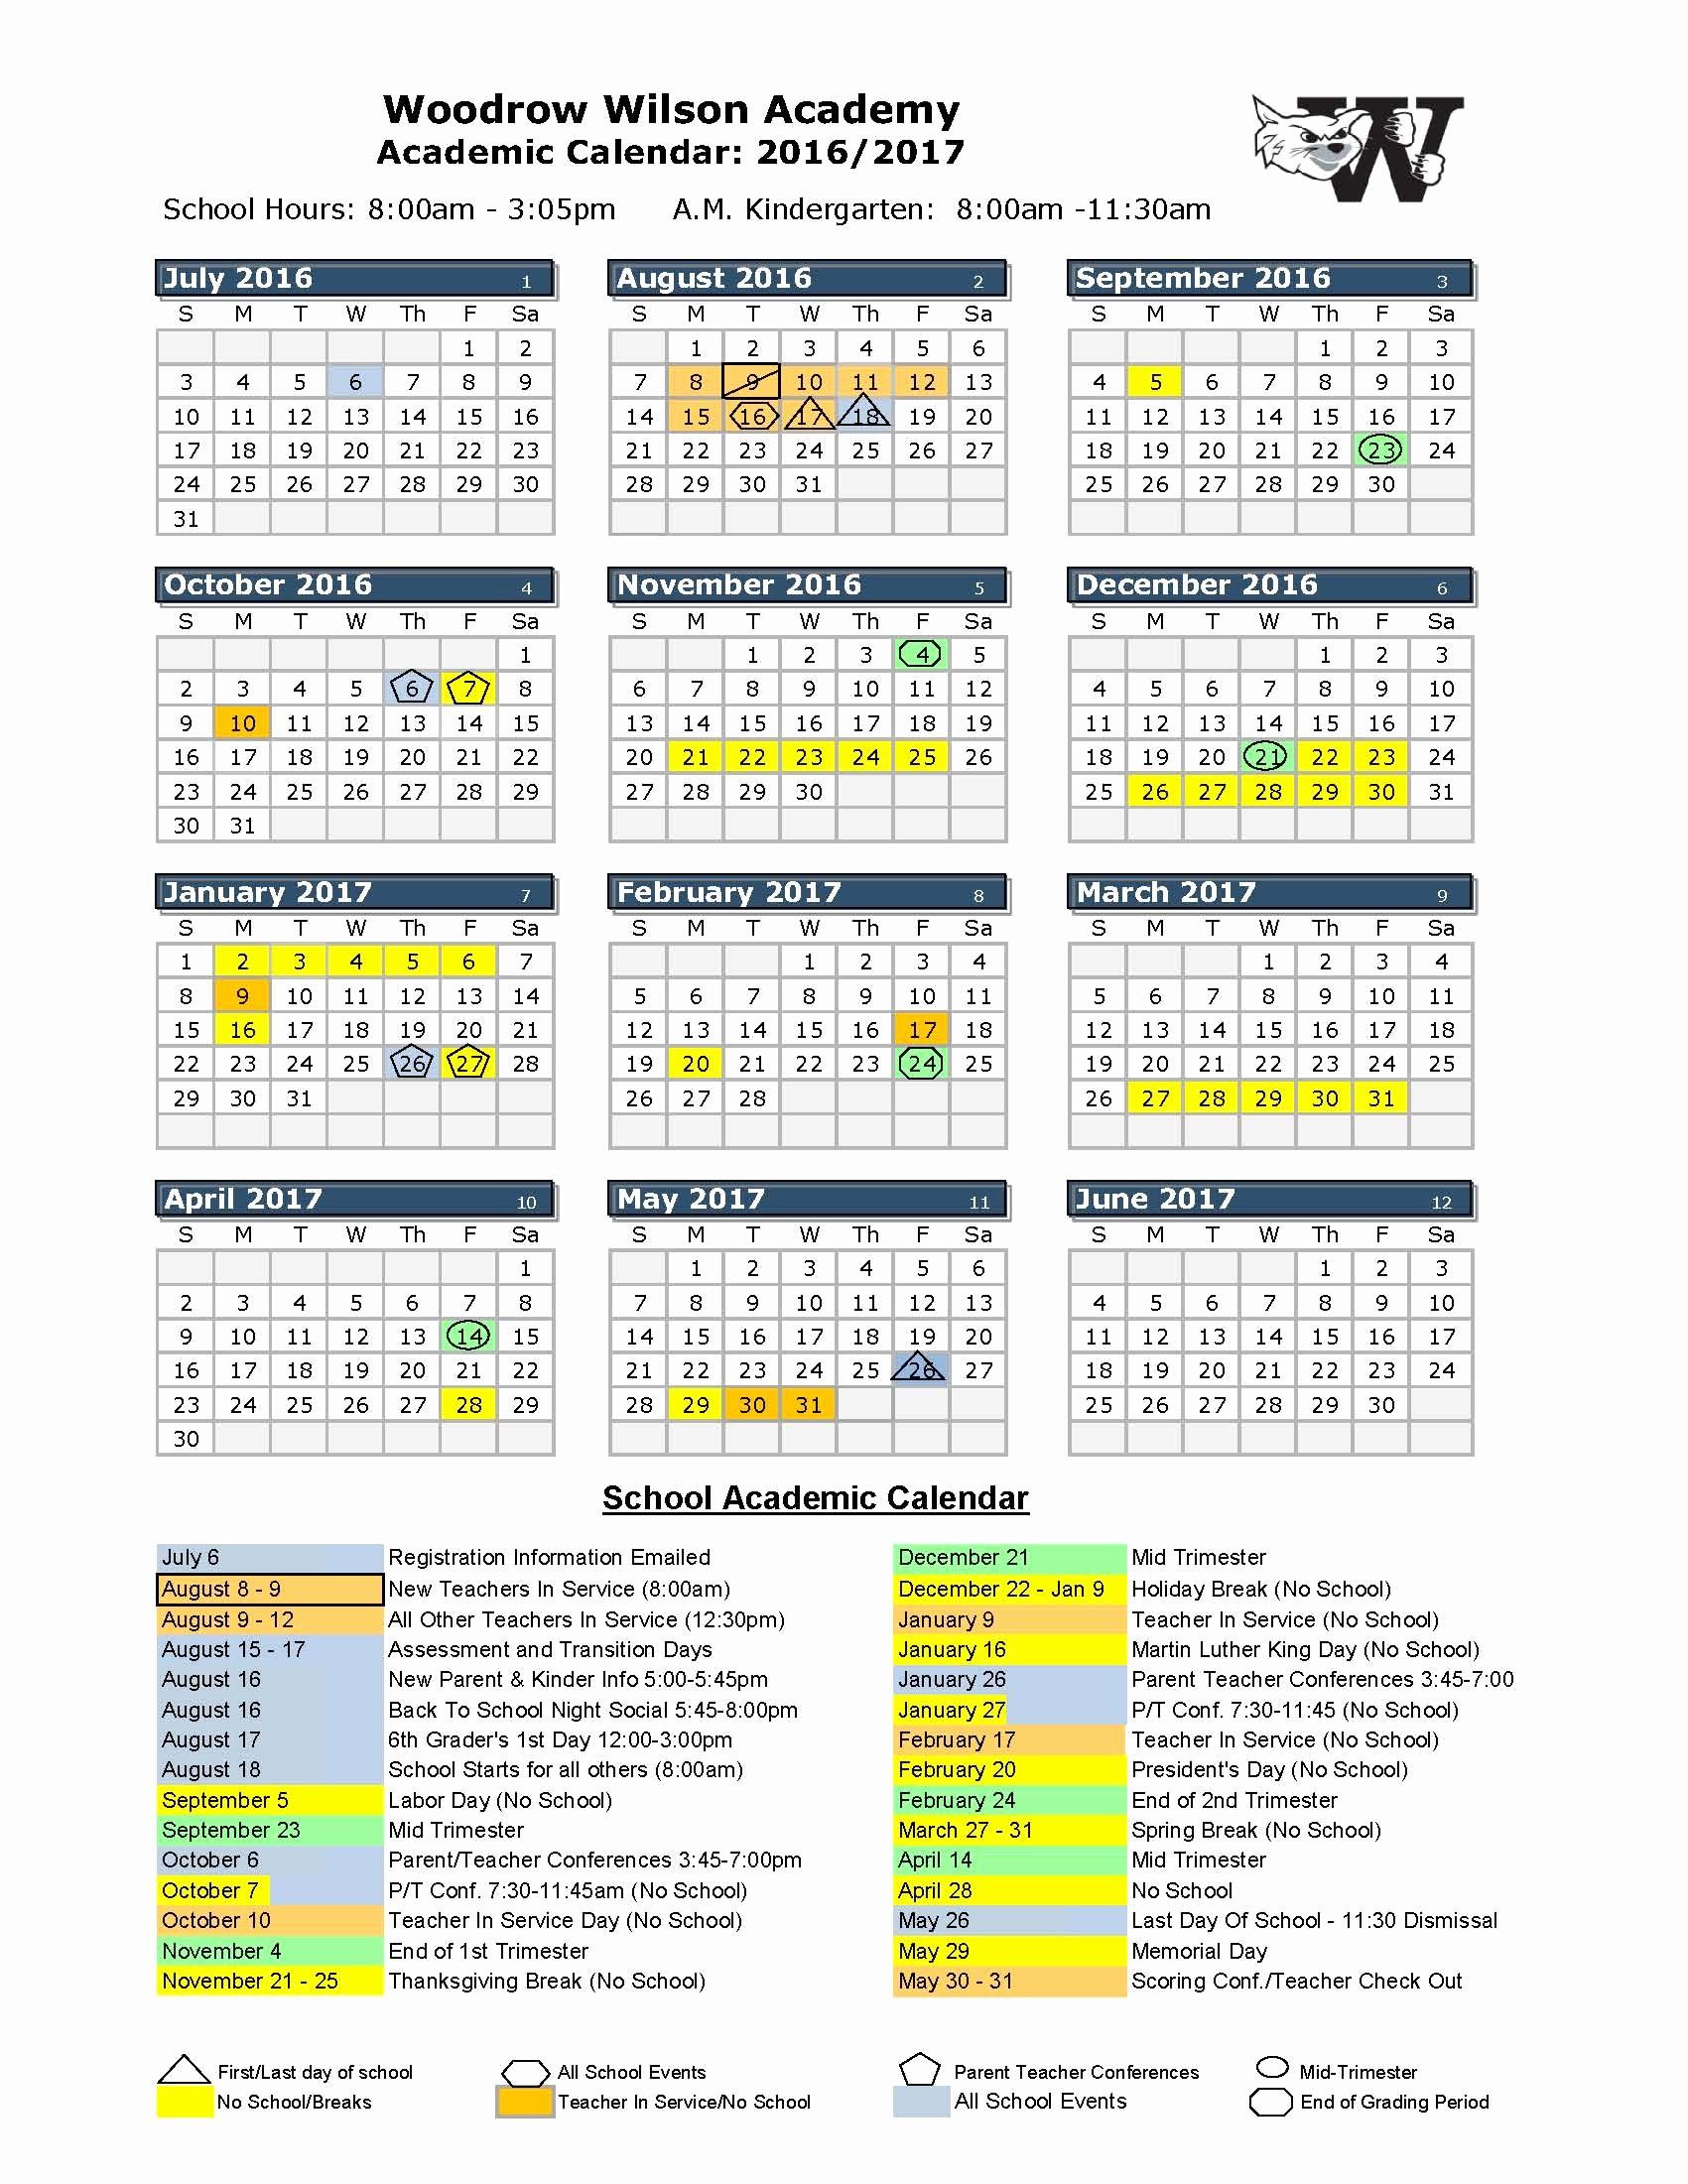 Blank Calendar 2016-17 New 2016 2017 School Calendar Woodrow Wilson Academy